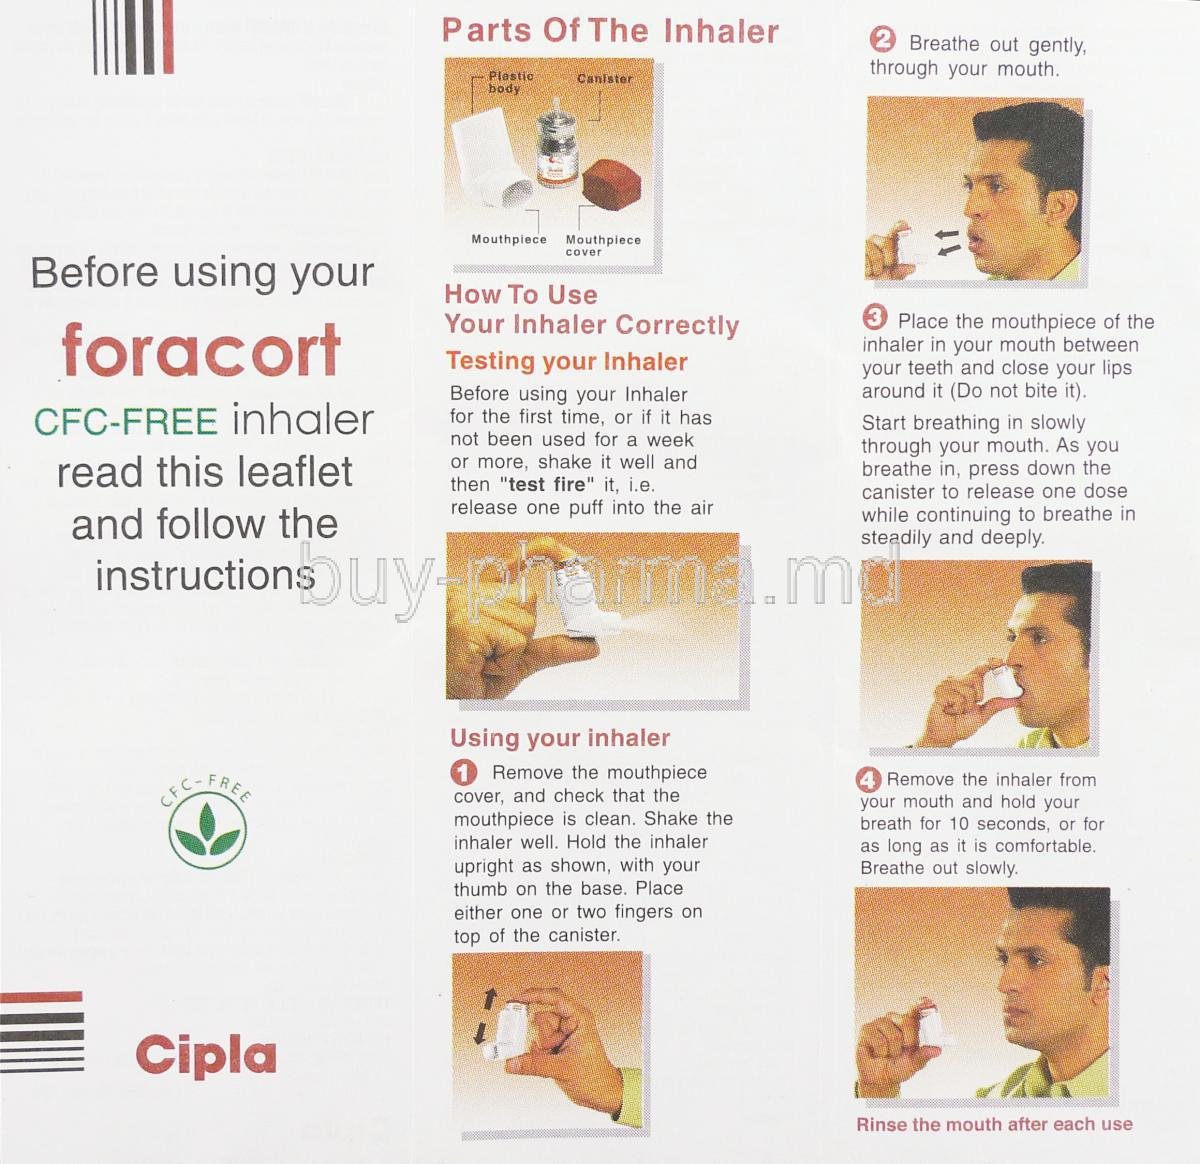 buy formoterol fumarate   budesonide inhaler   generic symbicort   online